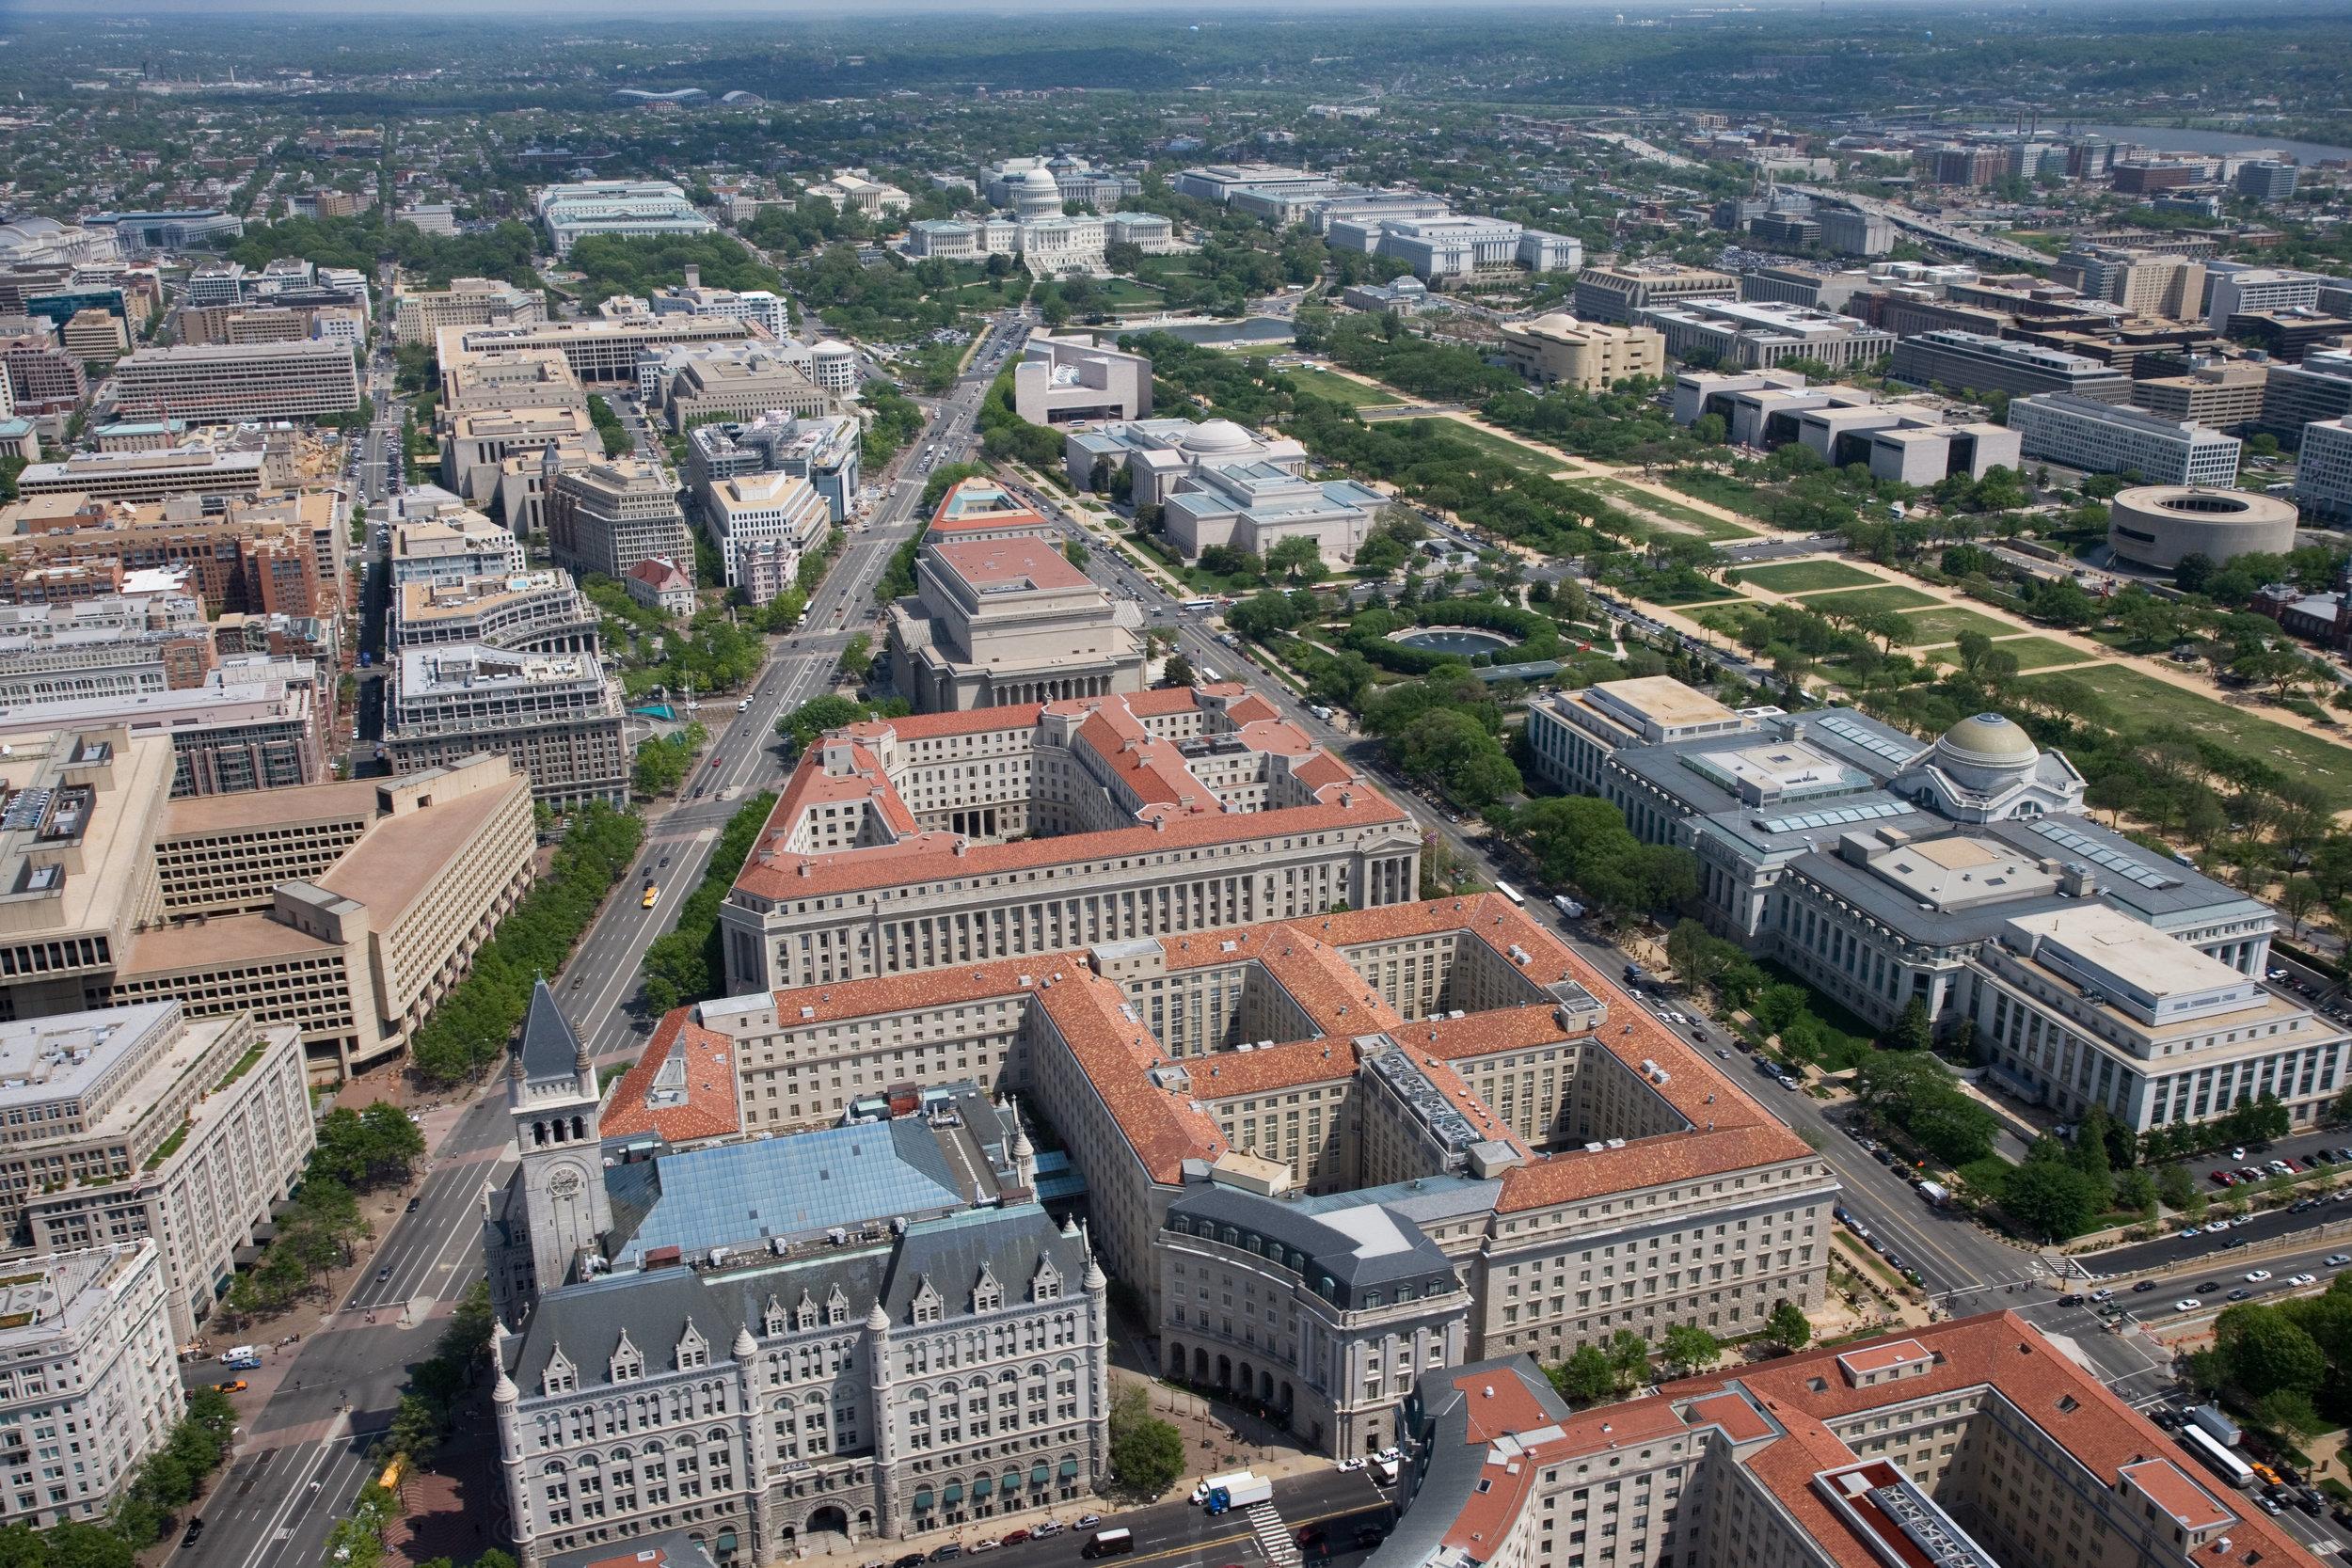 EPA Headquarters, Federal Triangle, Washington DC